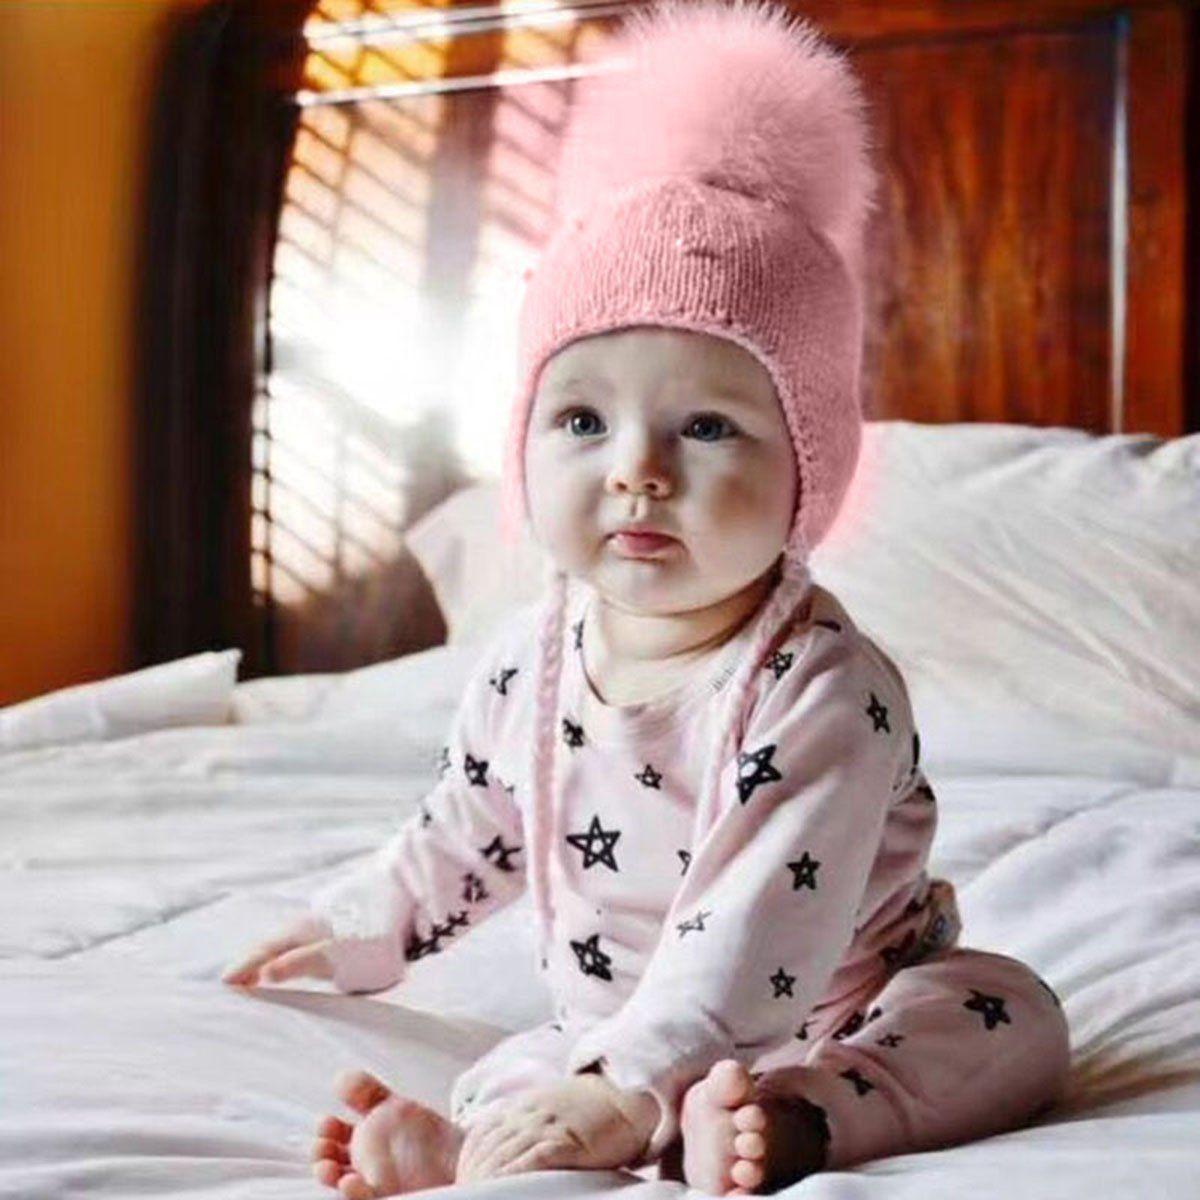 Hot sale solid cute Baby Toddler Kids Girl Infant Winter Warm Pearl Crochet Knit Hat Beanie Cap  Ears Beanie Fur Pompom Cap 1-3Y